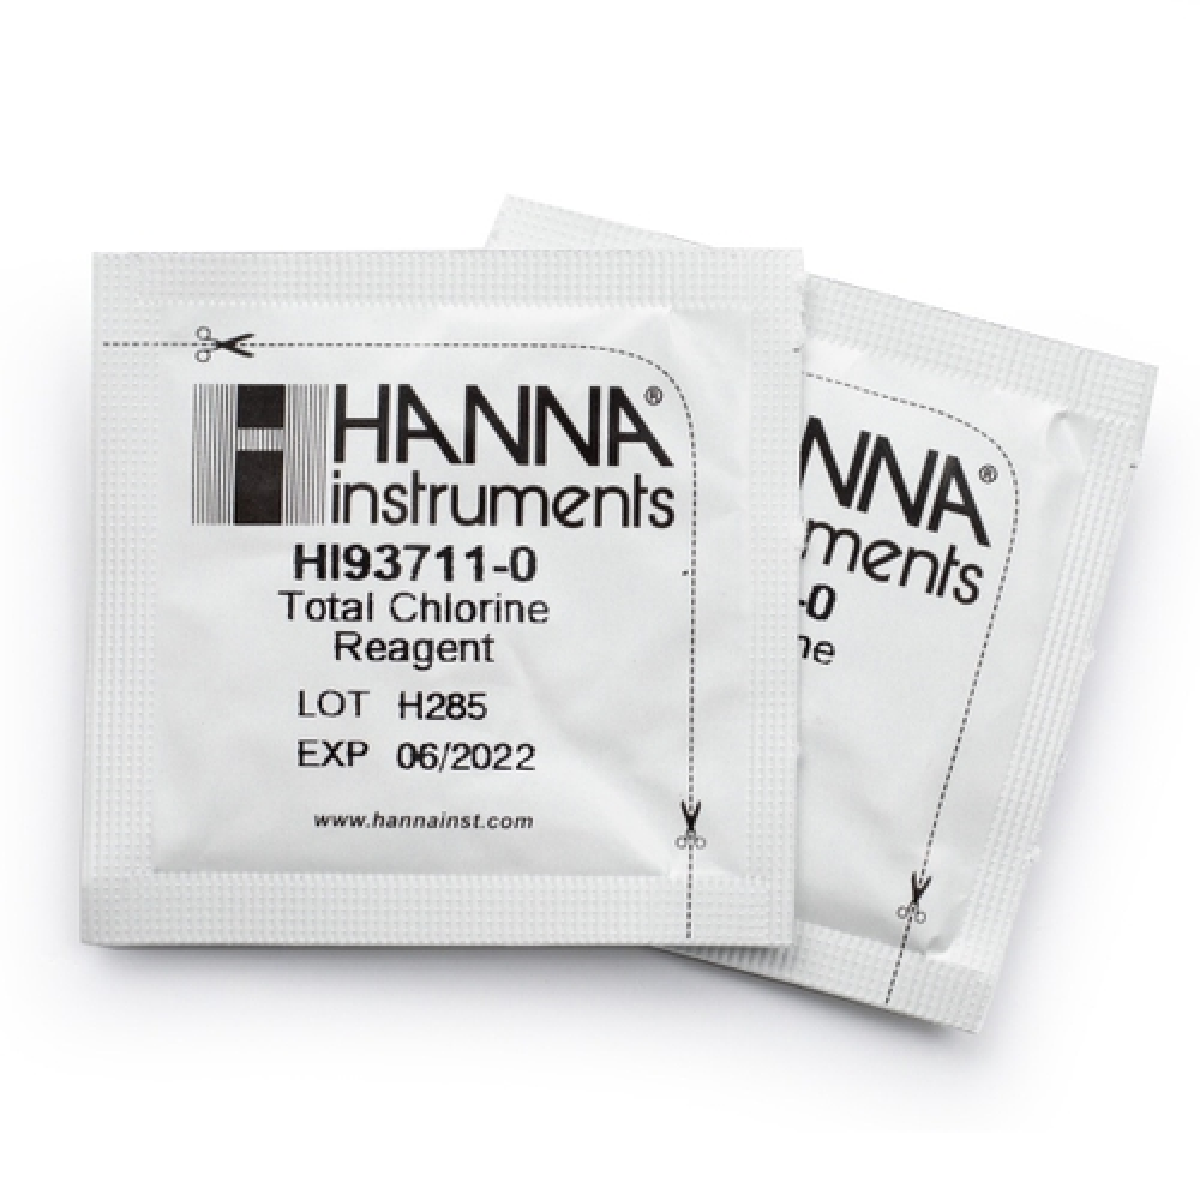 HI93711-01 Total Chlorine Reagents (100 tests)